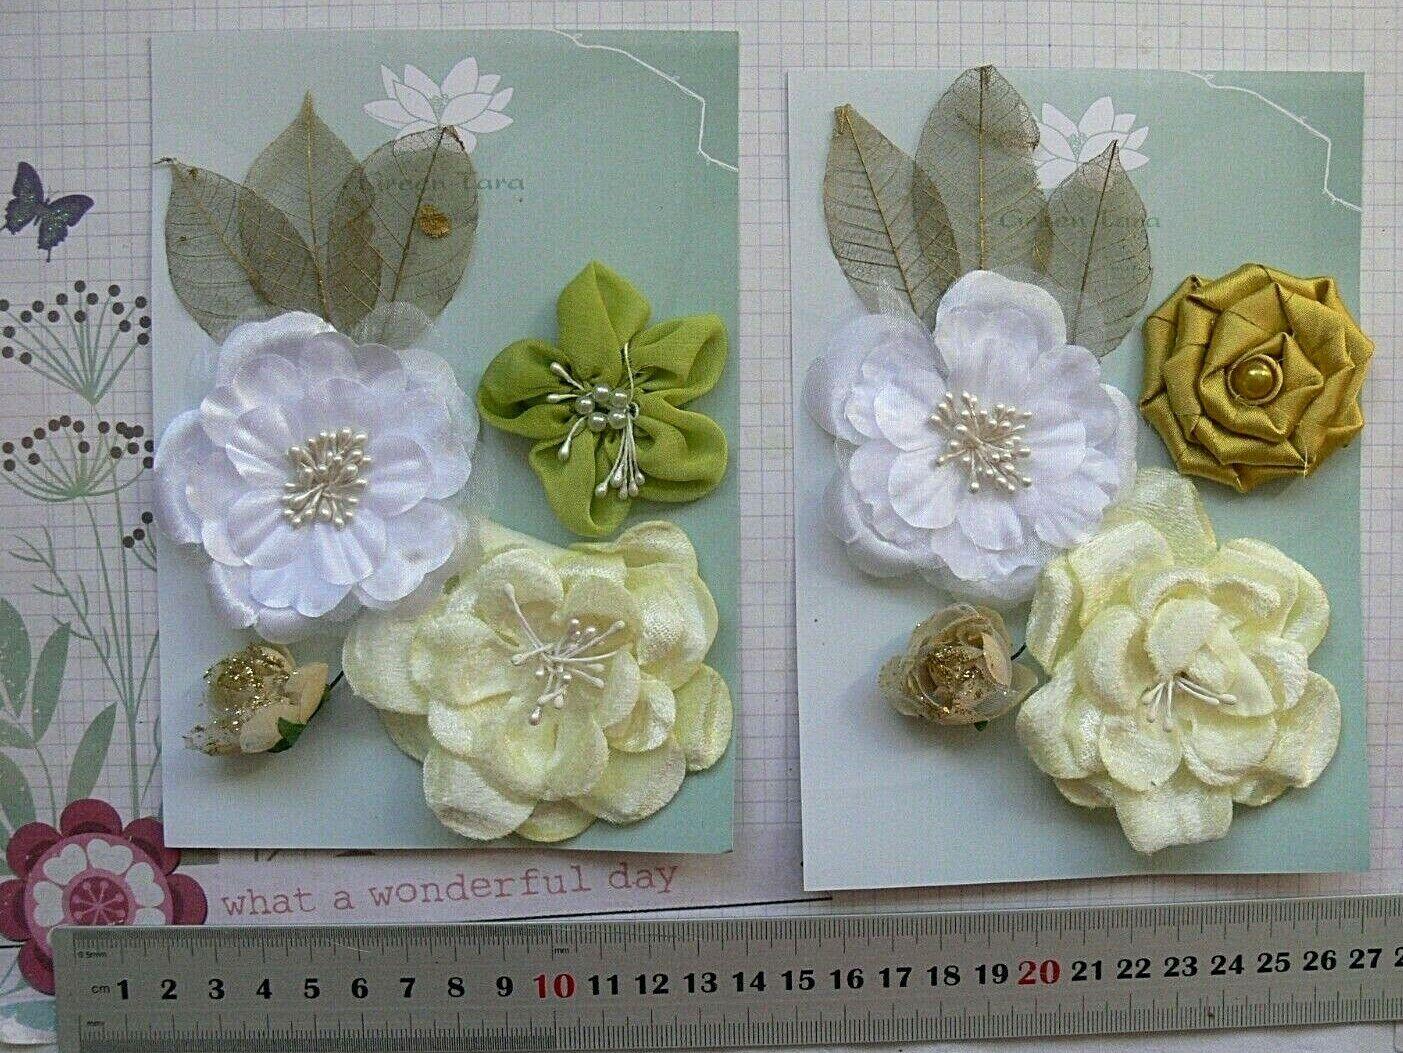 Fabric LEMON LIME BITTERS SatinOrganza 2-7cm 4 Flowers+GoldLeaves 2Pk Choice GT2